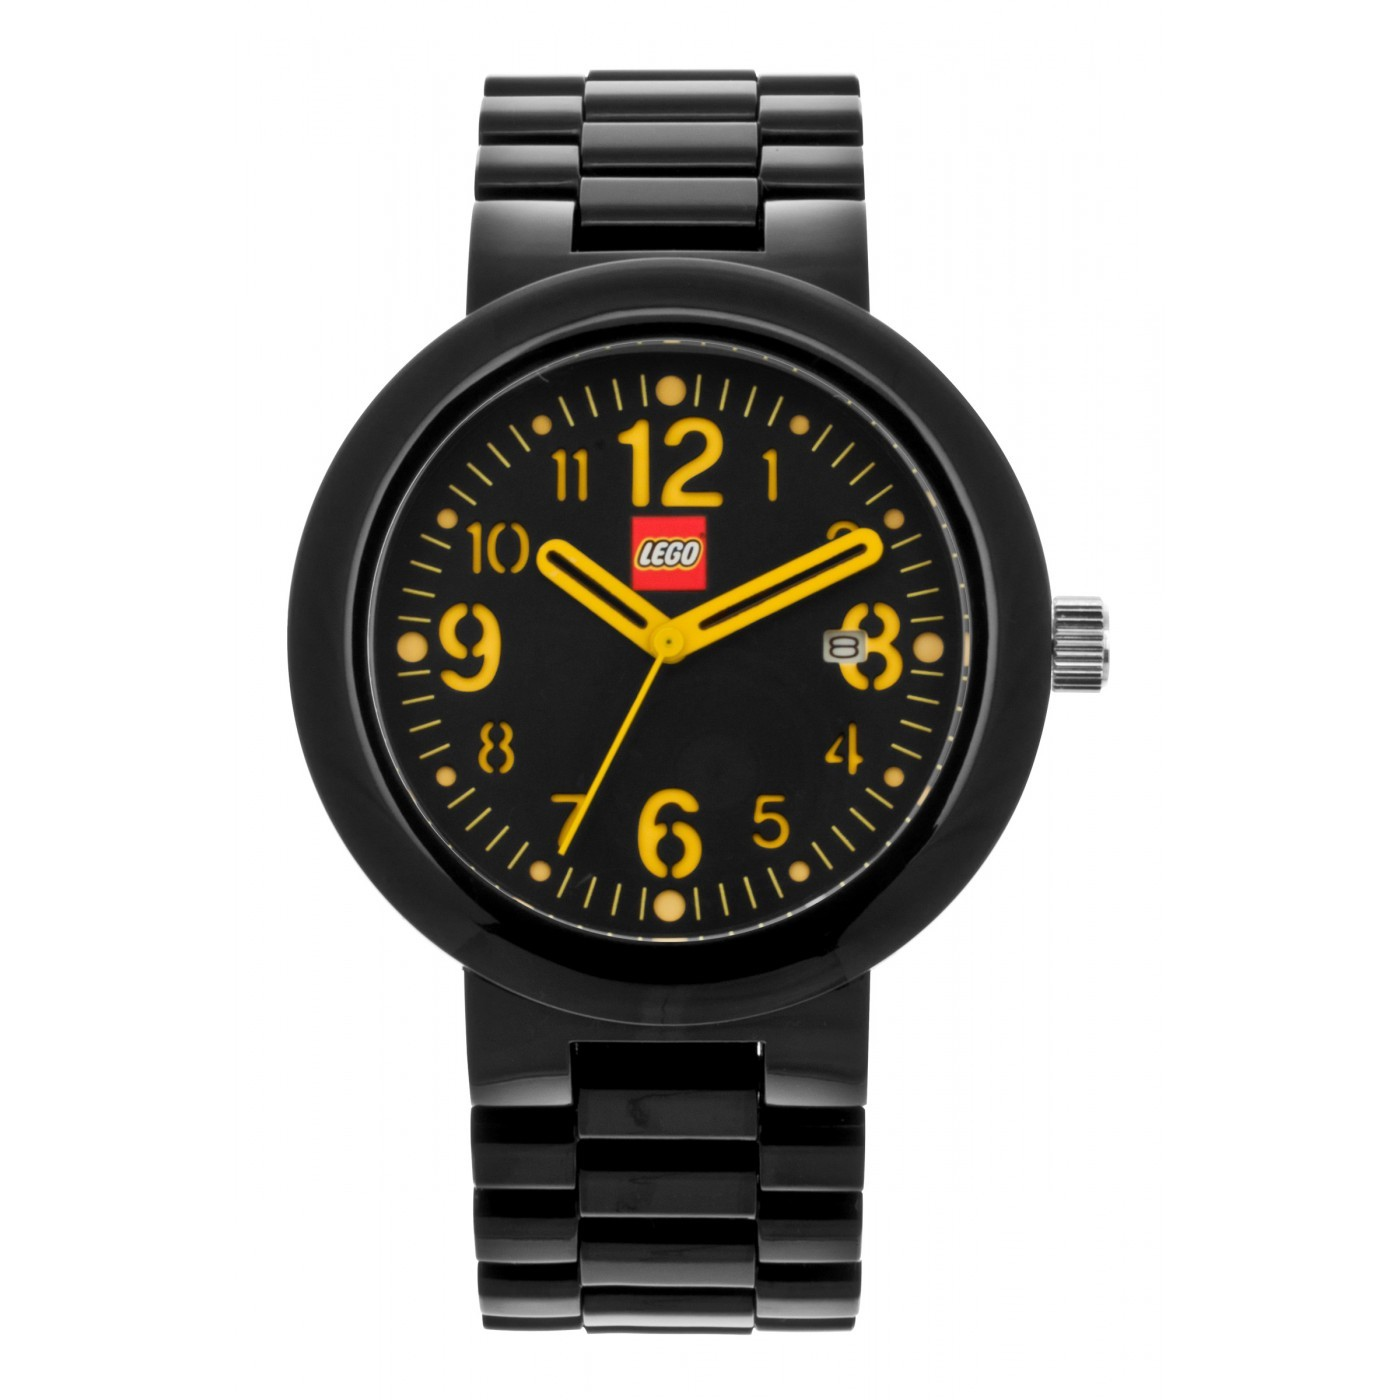 1400x1400 Lego Silhouette Black Adult Watch